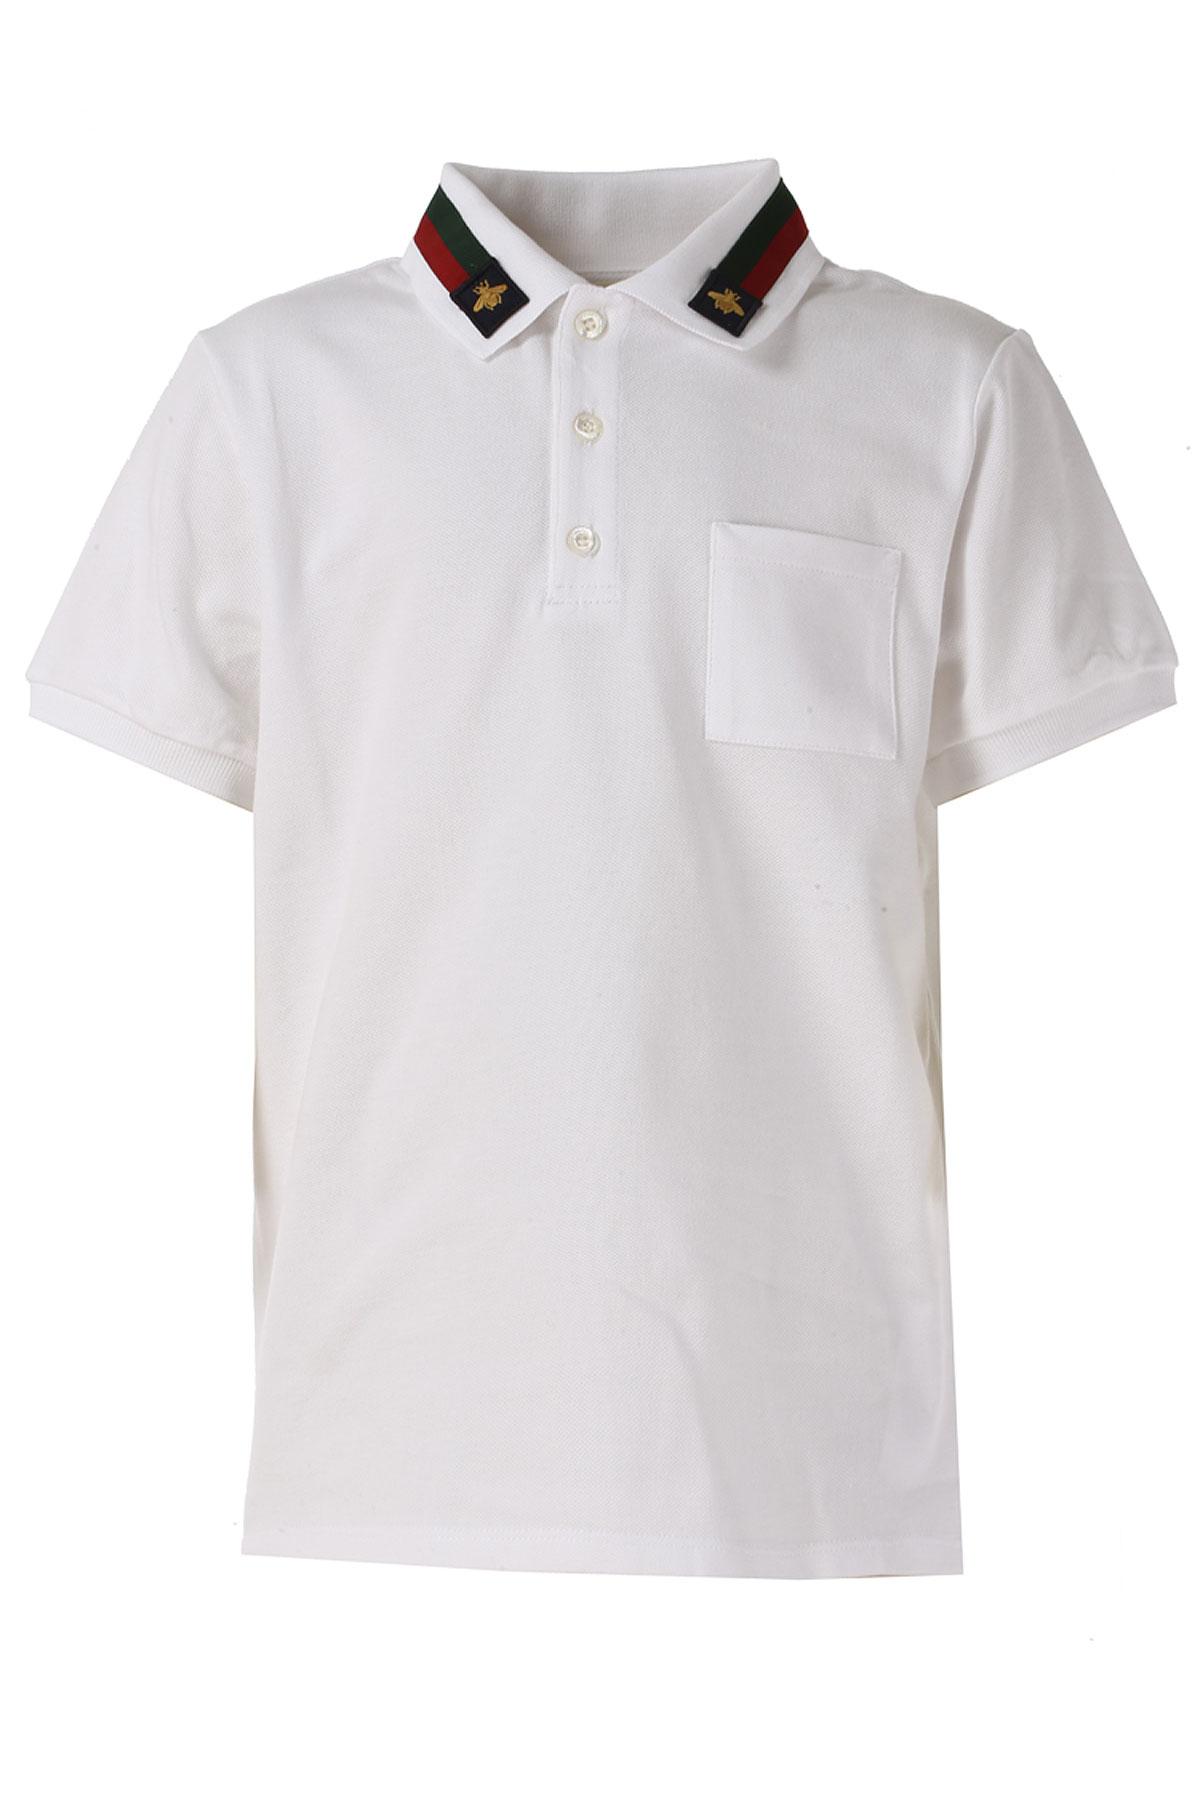 a24931c5dcad Kidswear Gucci, Style code: 455206-x5j10-9176